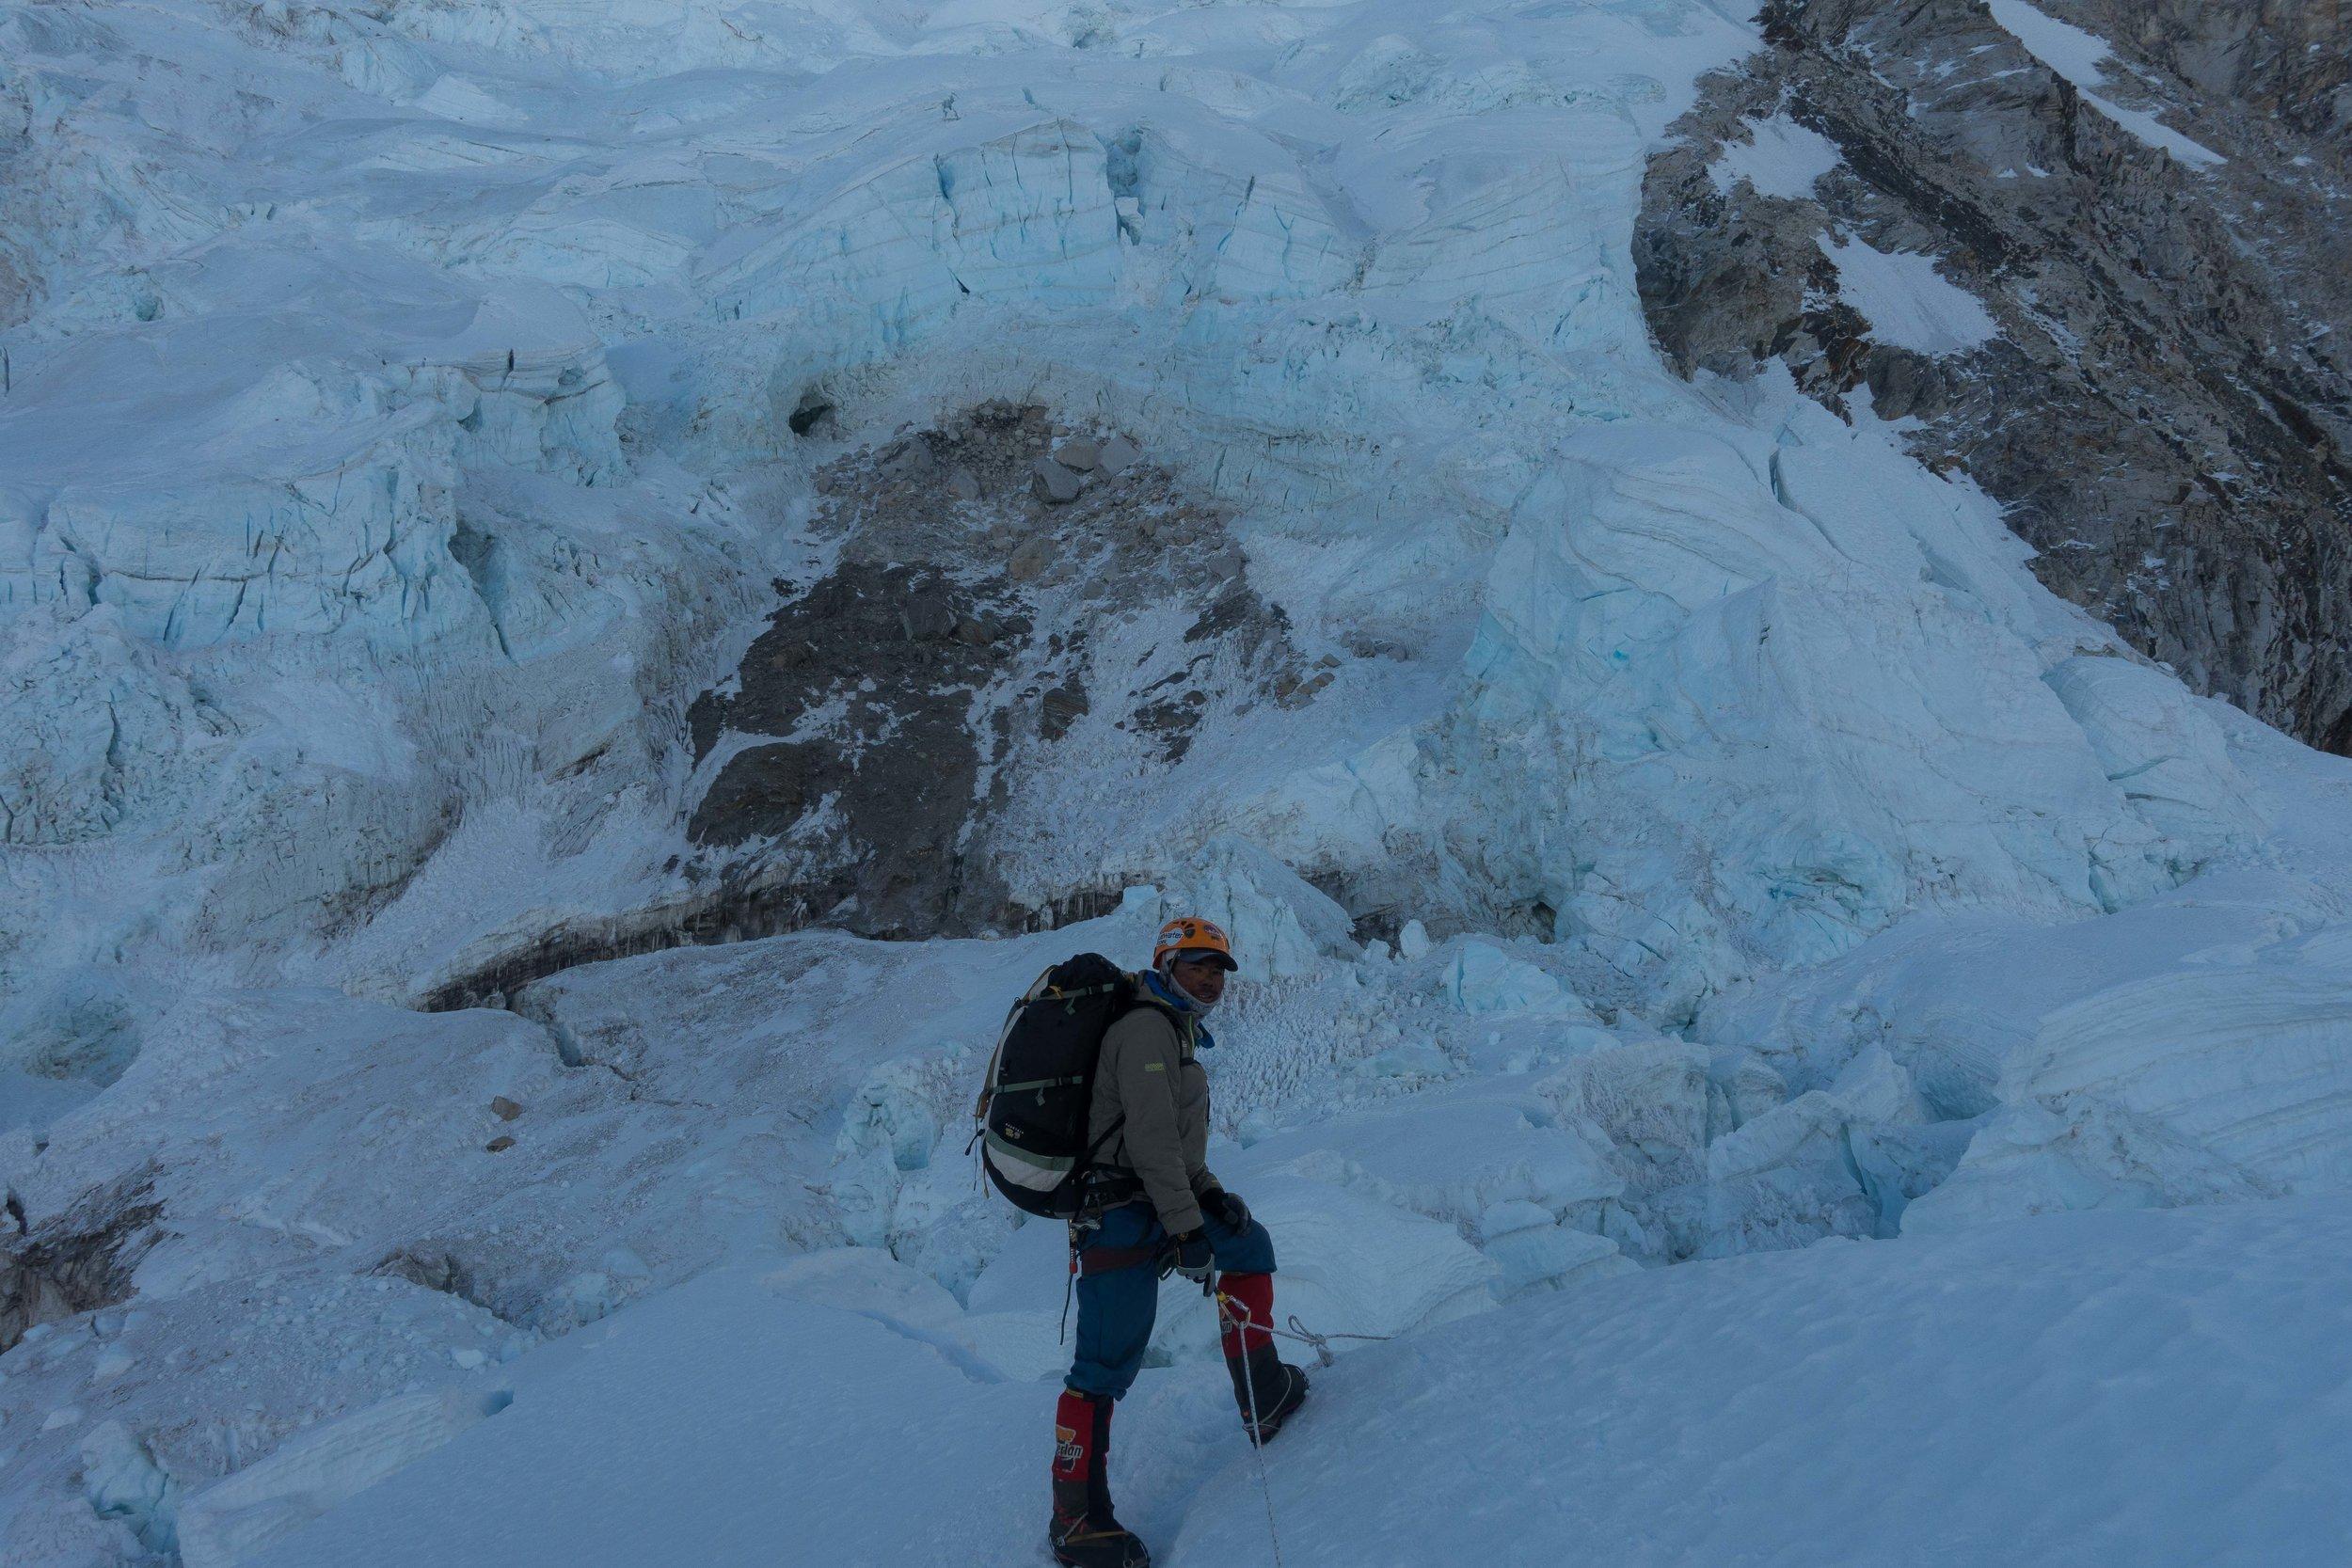 My Sherpa, Chhewang Lendu